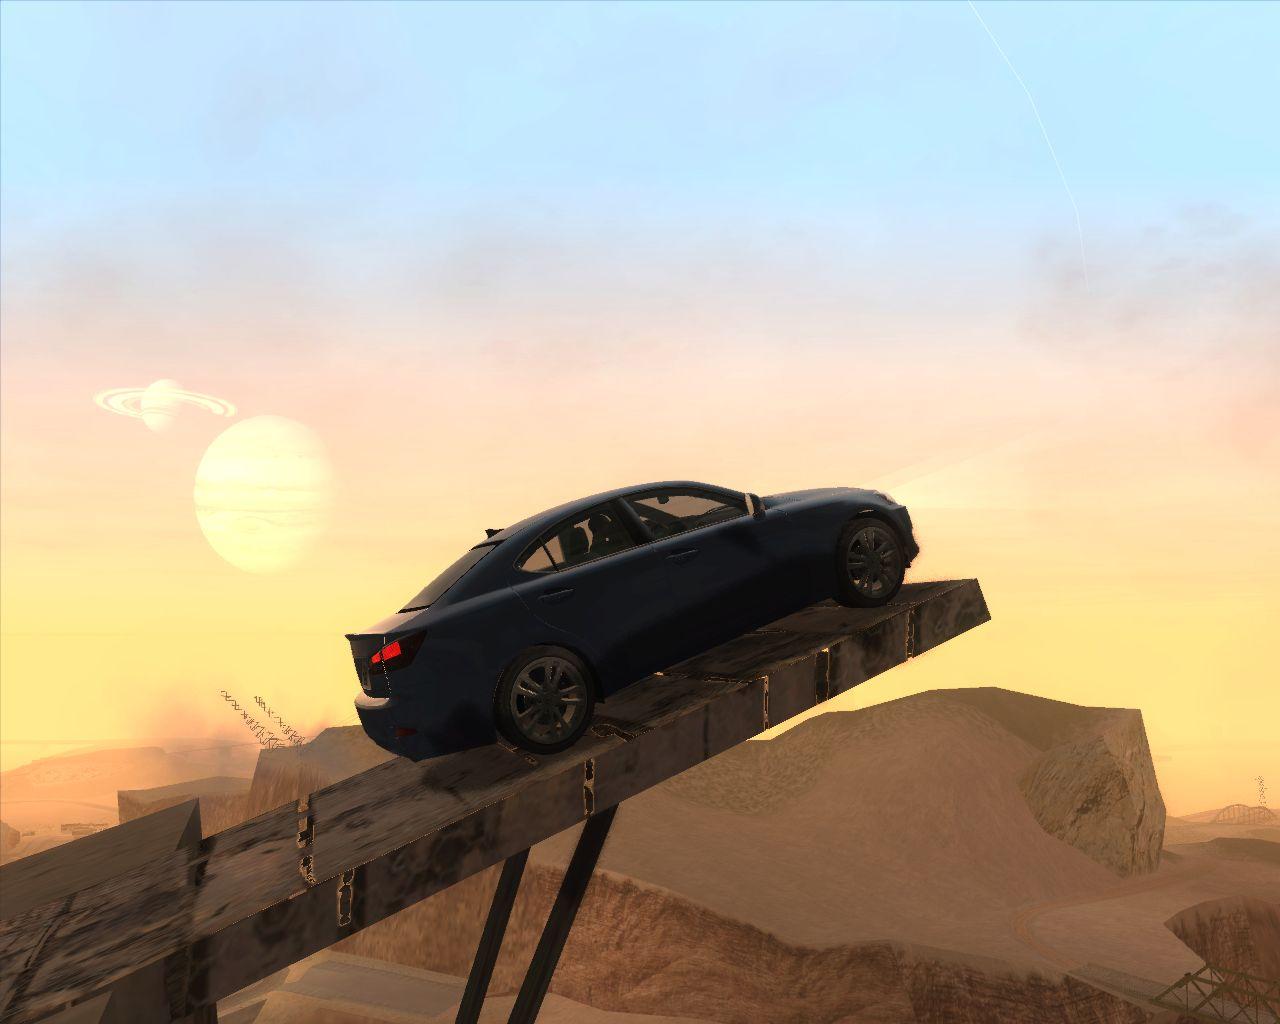 gta_sa 2008-04-27 22-43-40-89.jpg - Grand Theft Auto: San Andreas